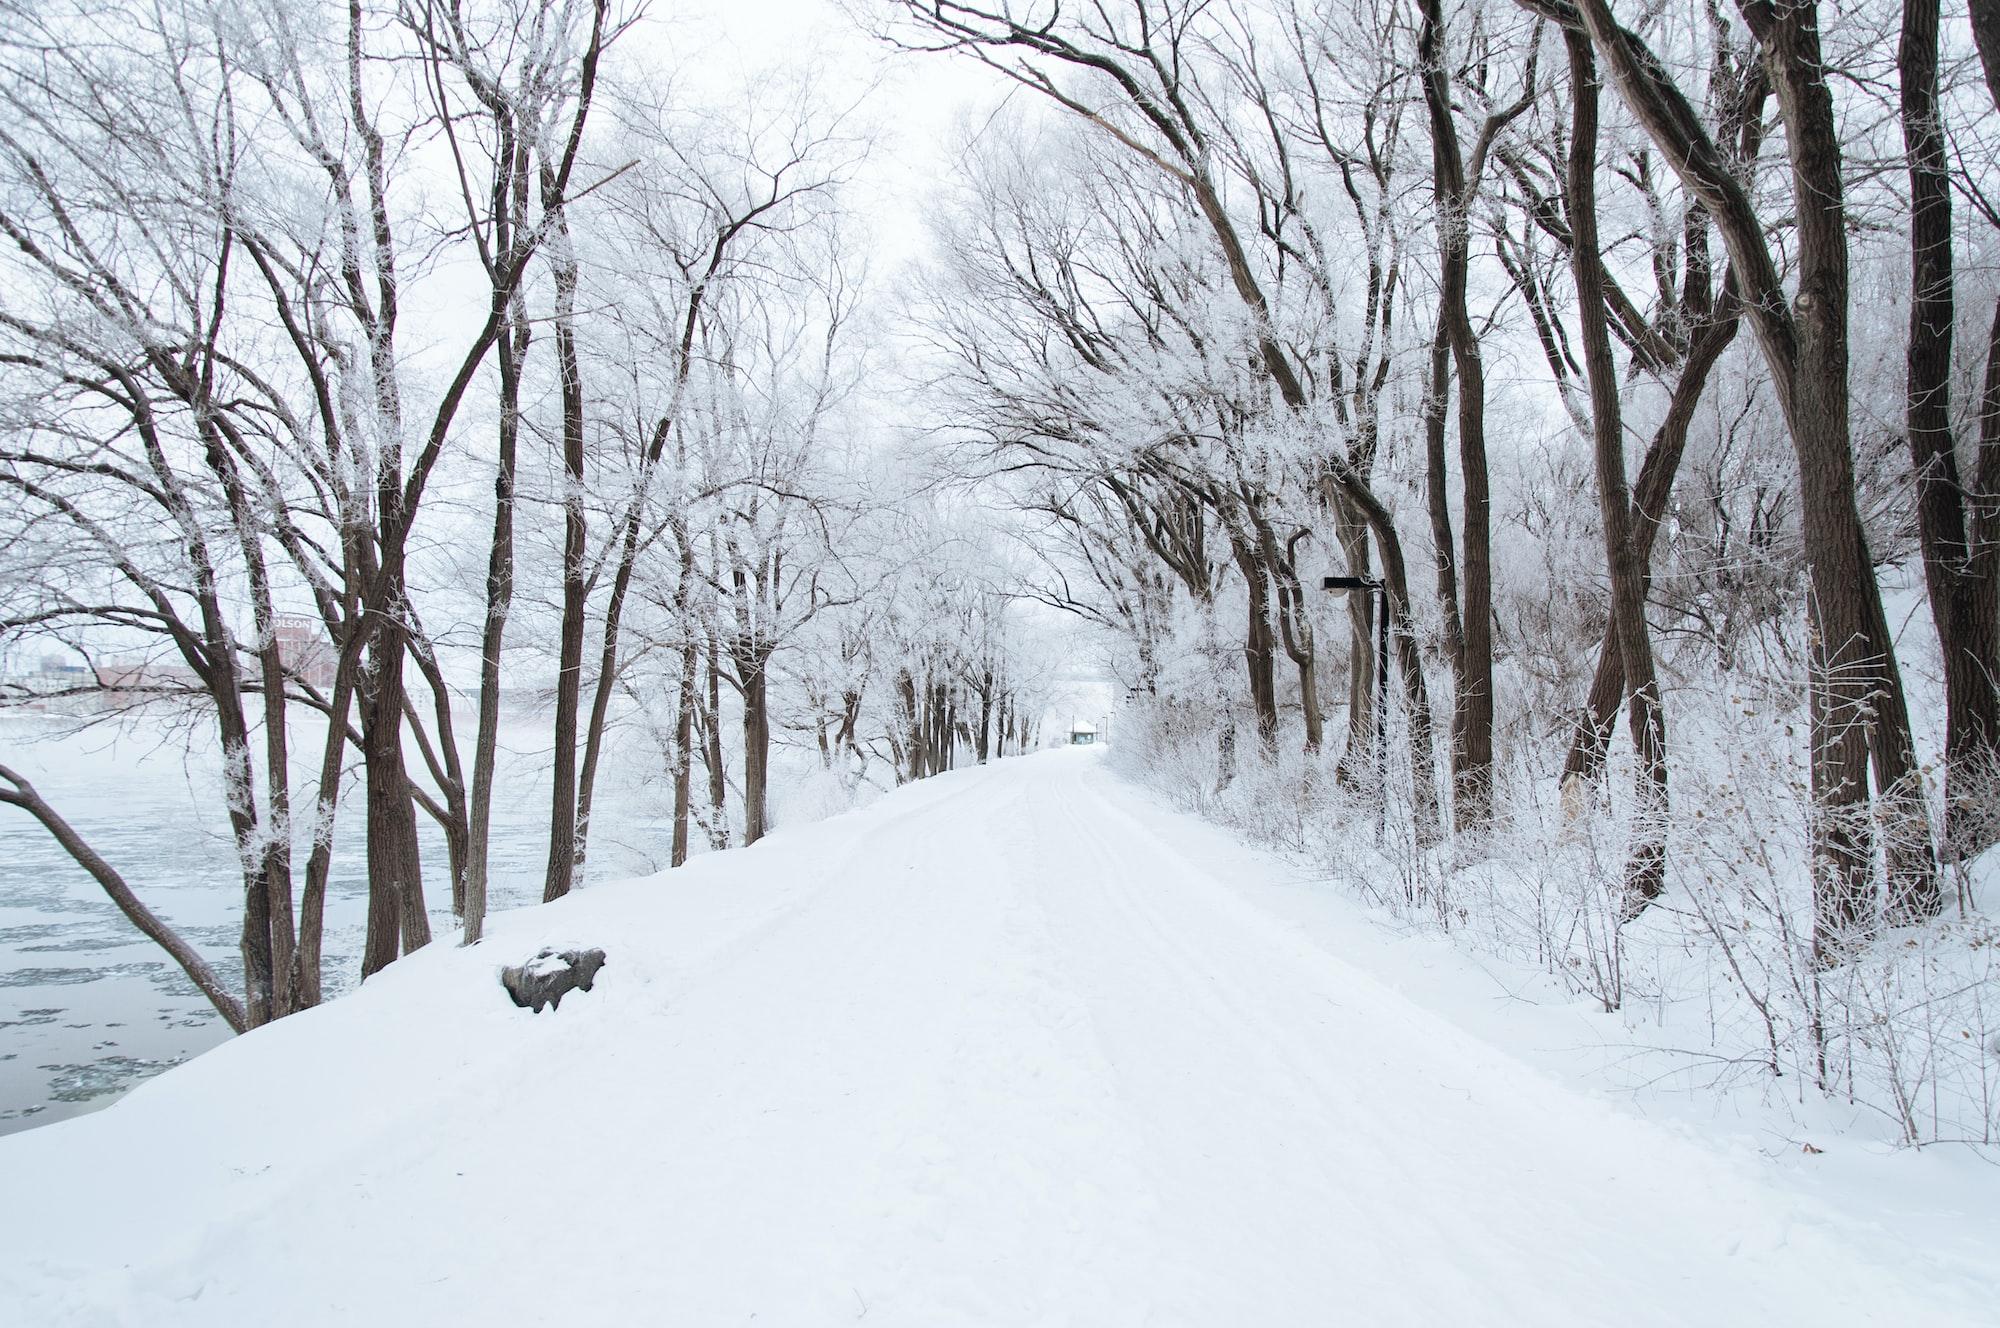 Students versus the winter weather